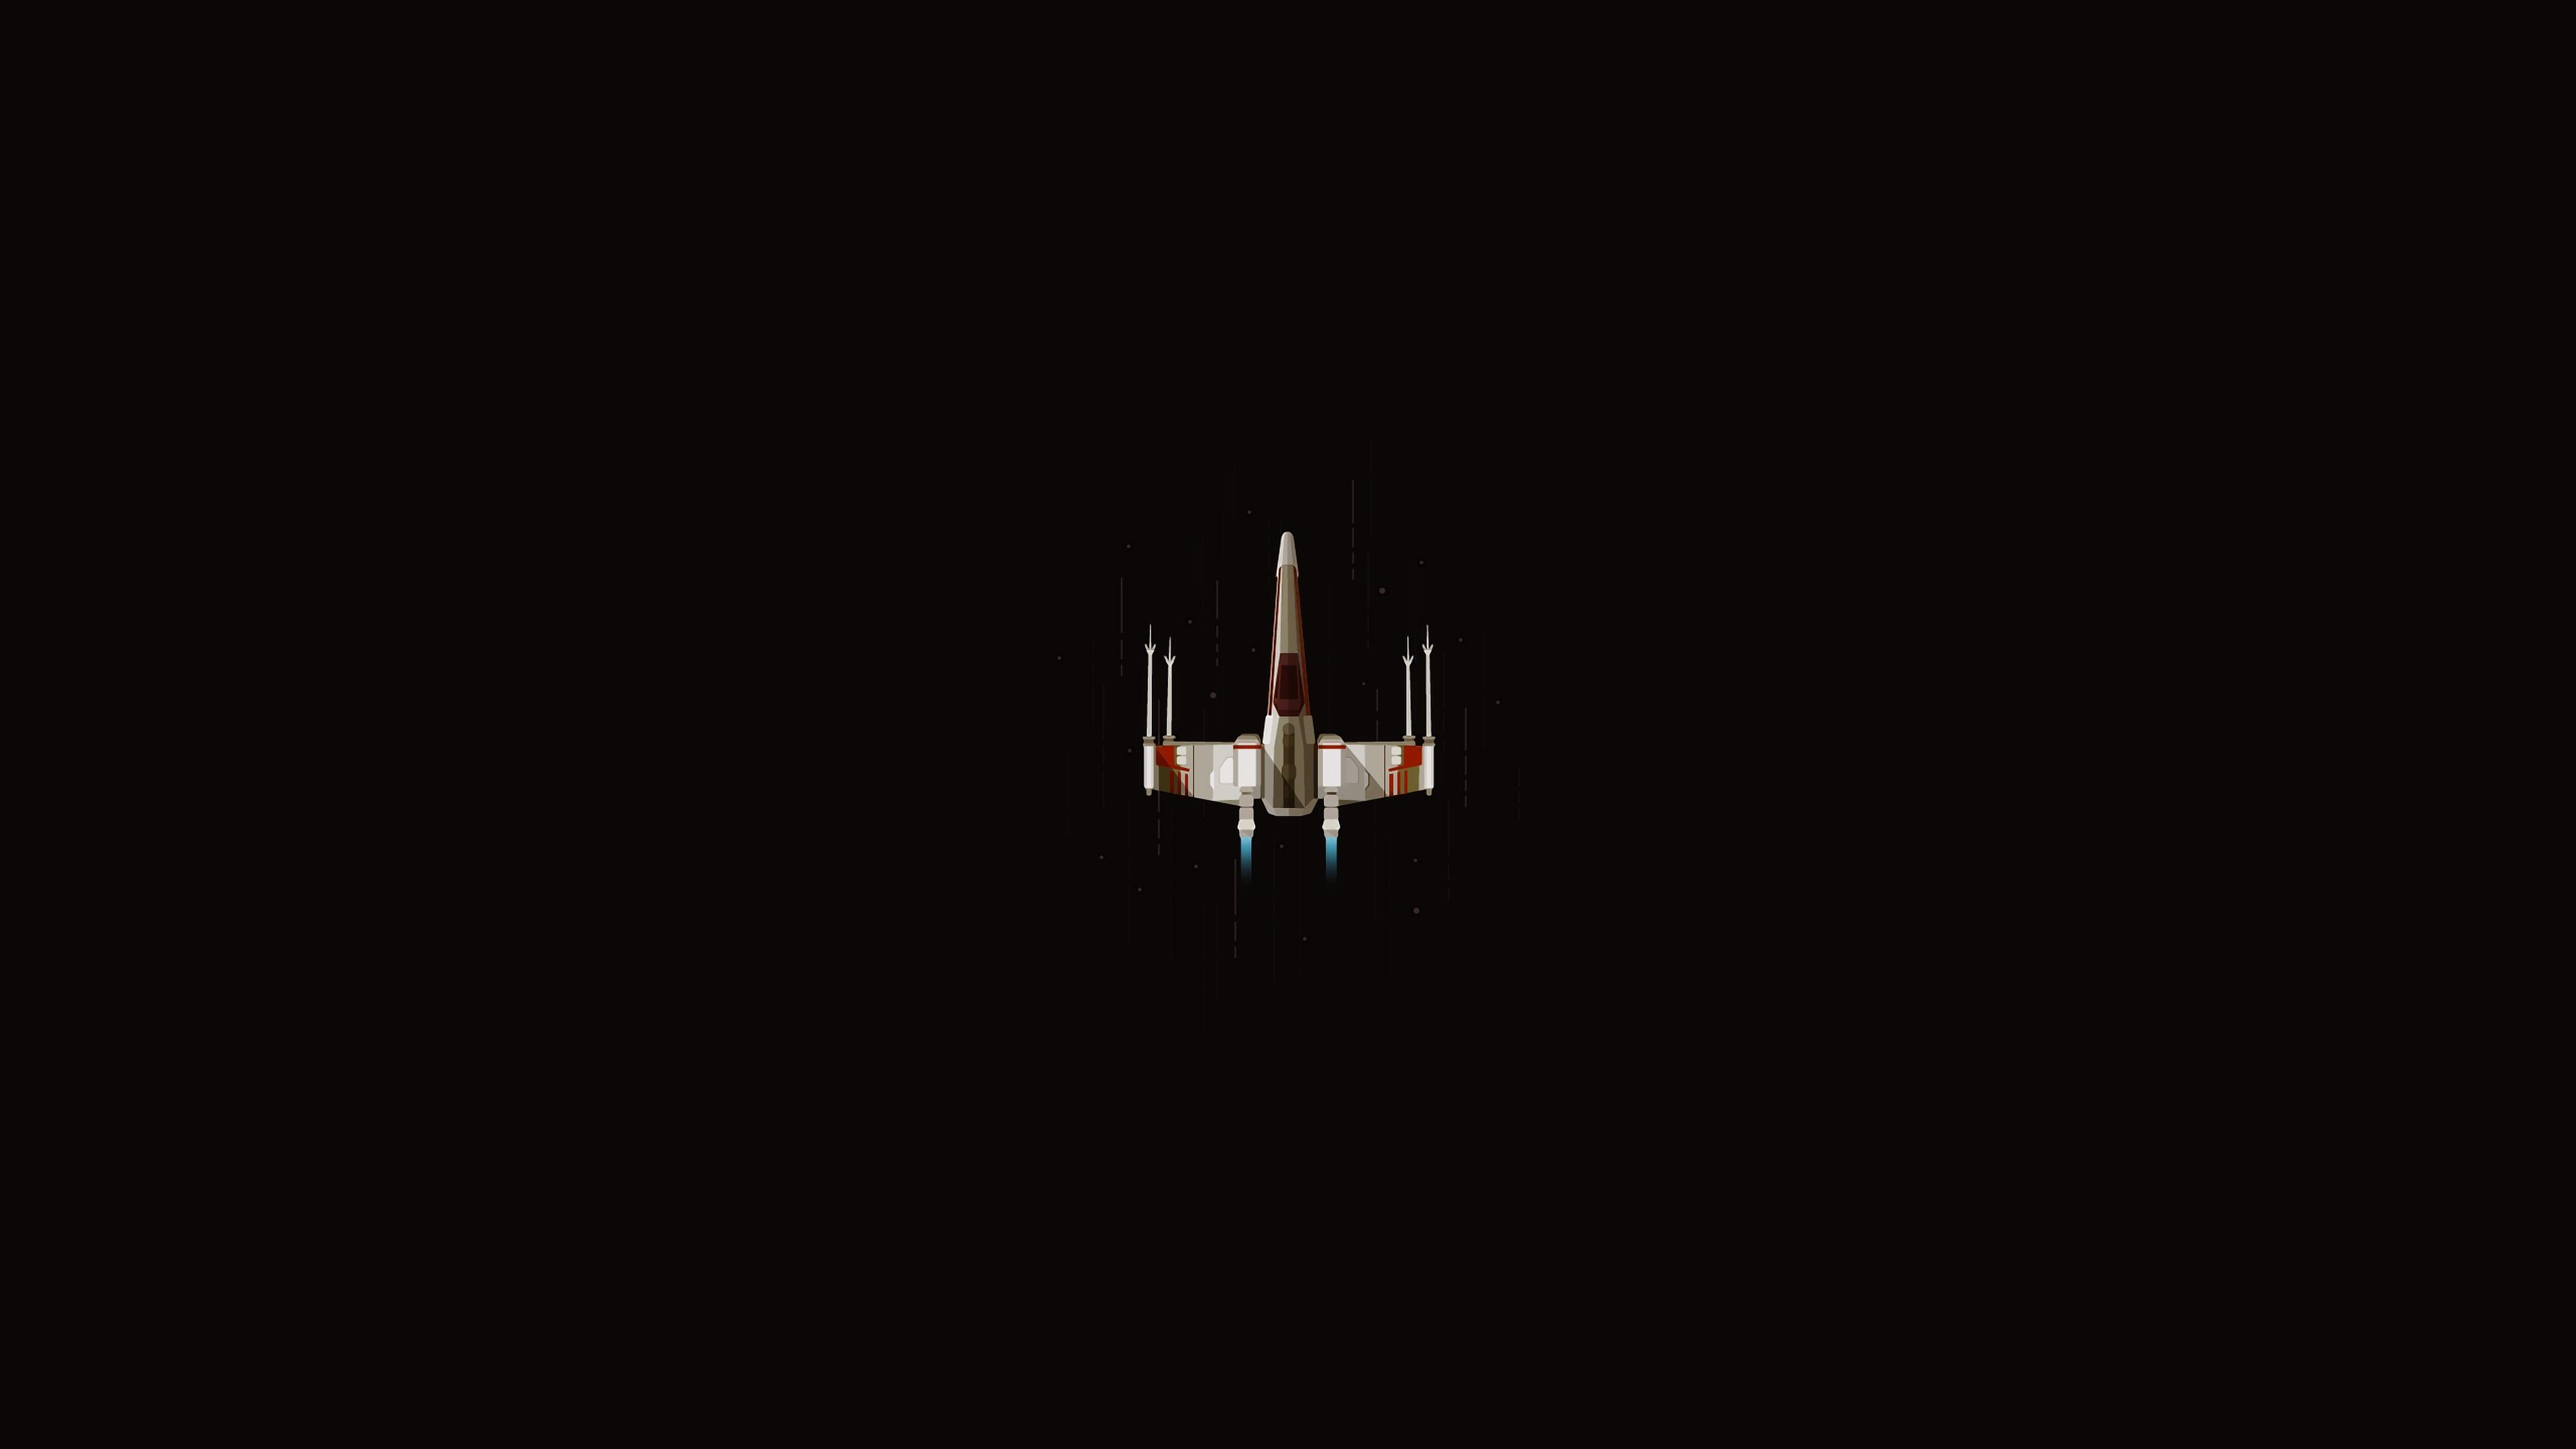 Star Wars X Wing Minimalism Simple Star Wars Ships Science Fiction 3840x2160